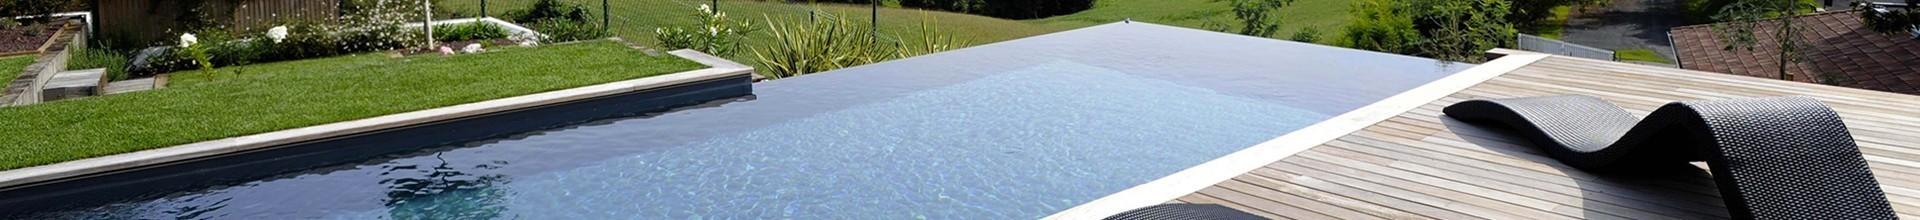 Direct usine, piscine coque prix Morbihan